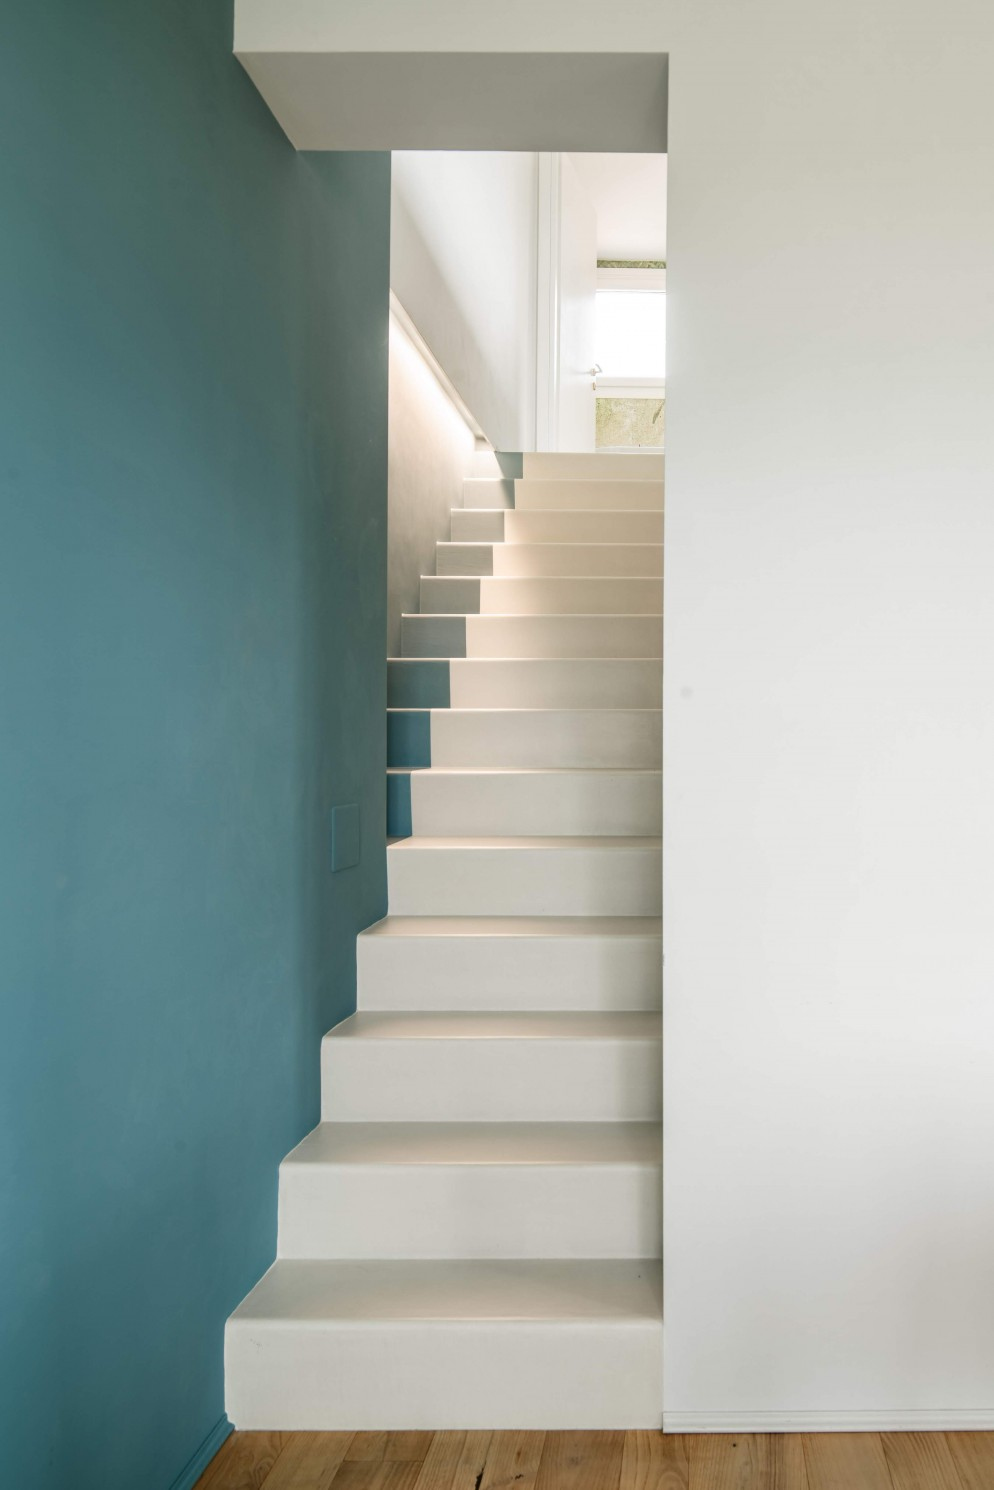 11 Kind of Blue_PH Jacopo Carli